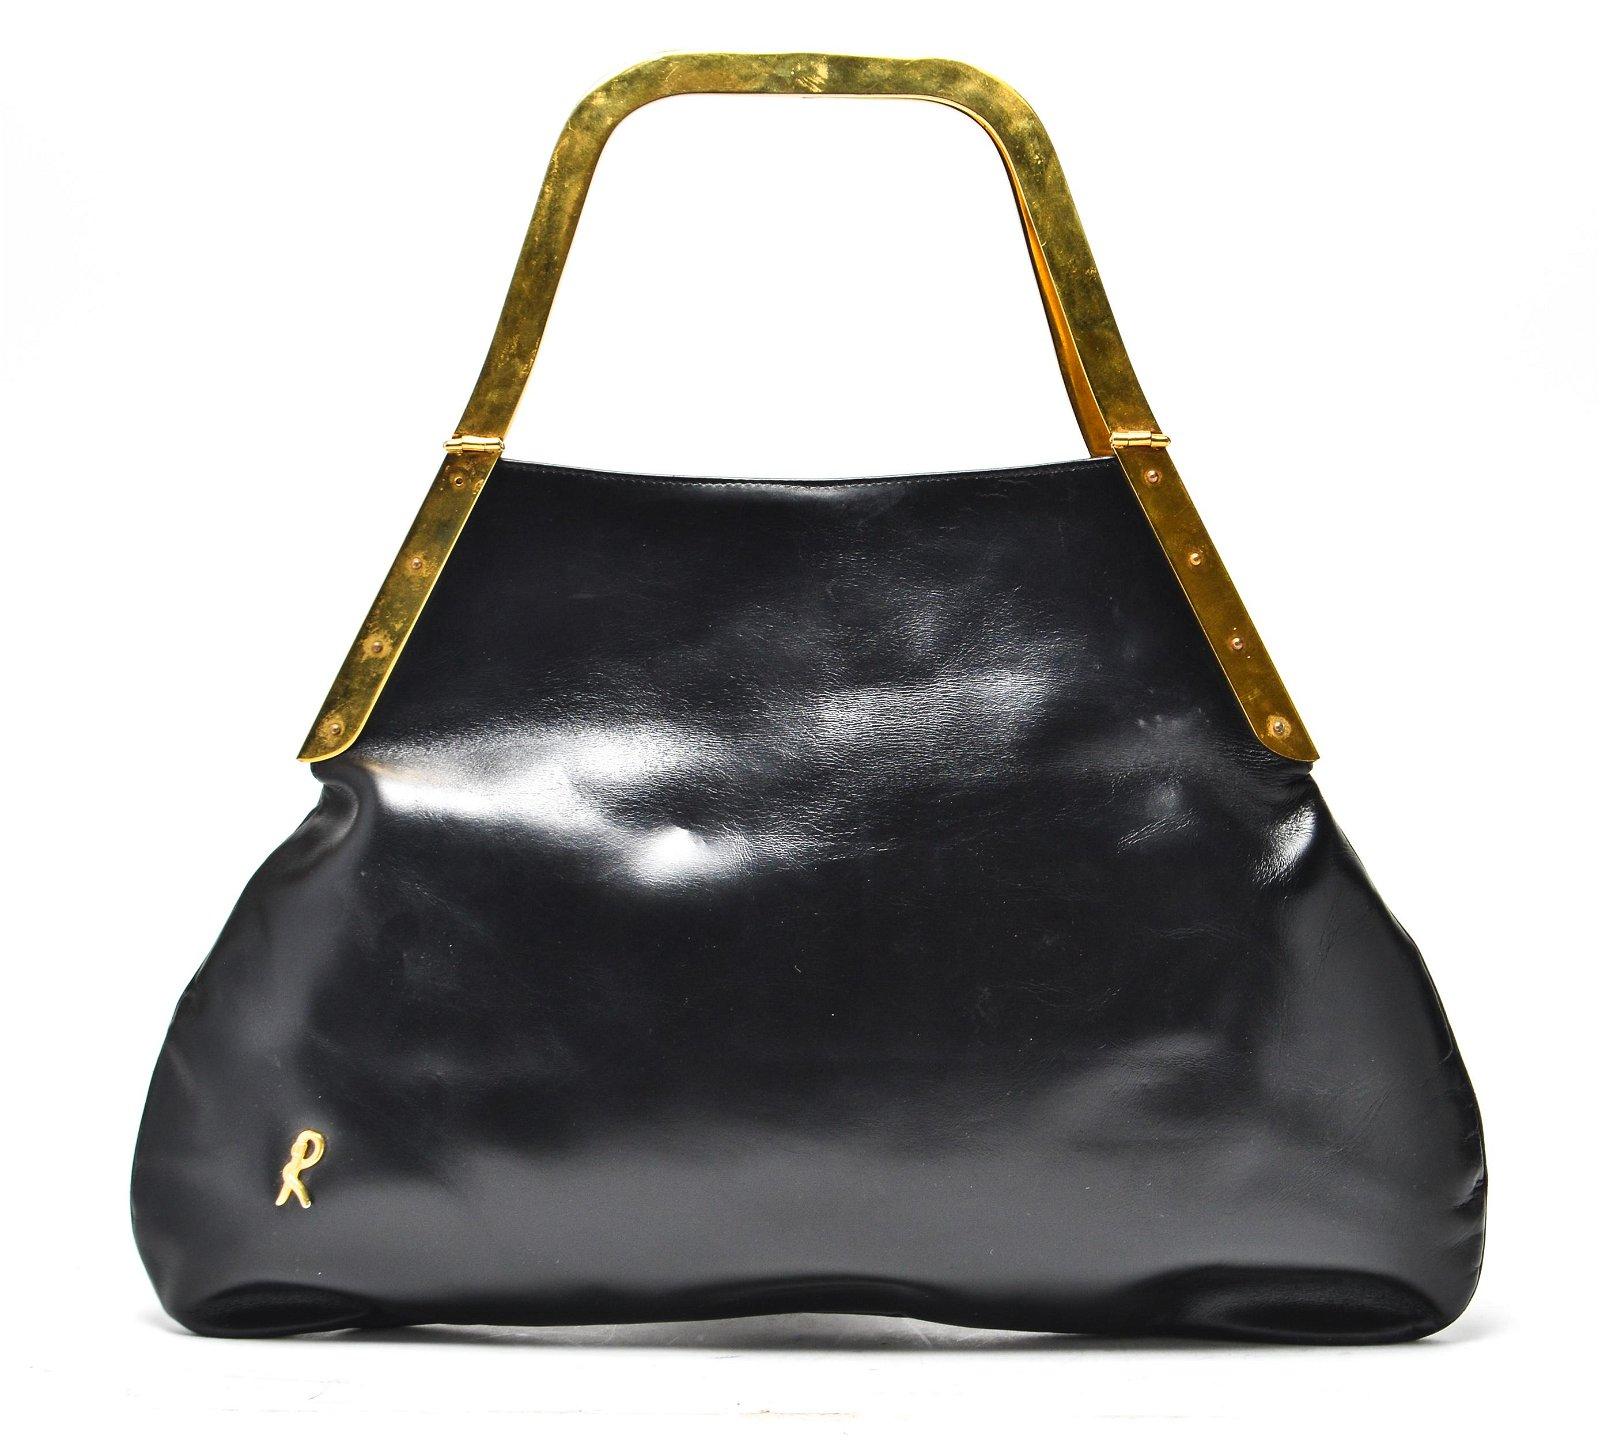 Roberta di Camerino Black Leather & Gold-Tone Bag